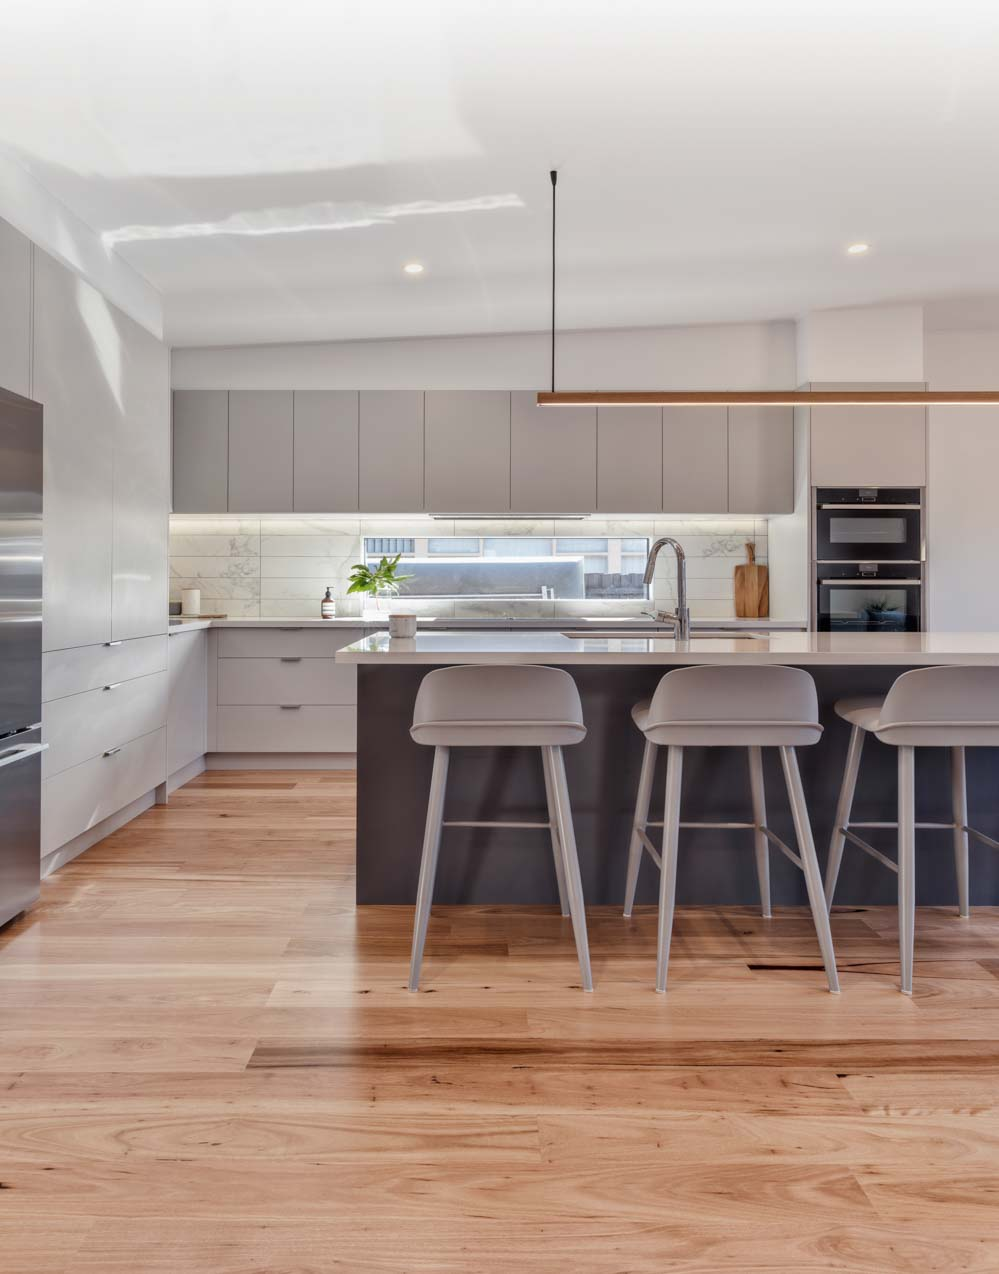 kitchen-granny-flats-image-garden-studios-au